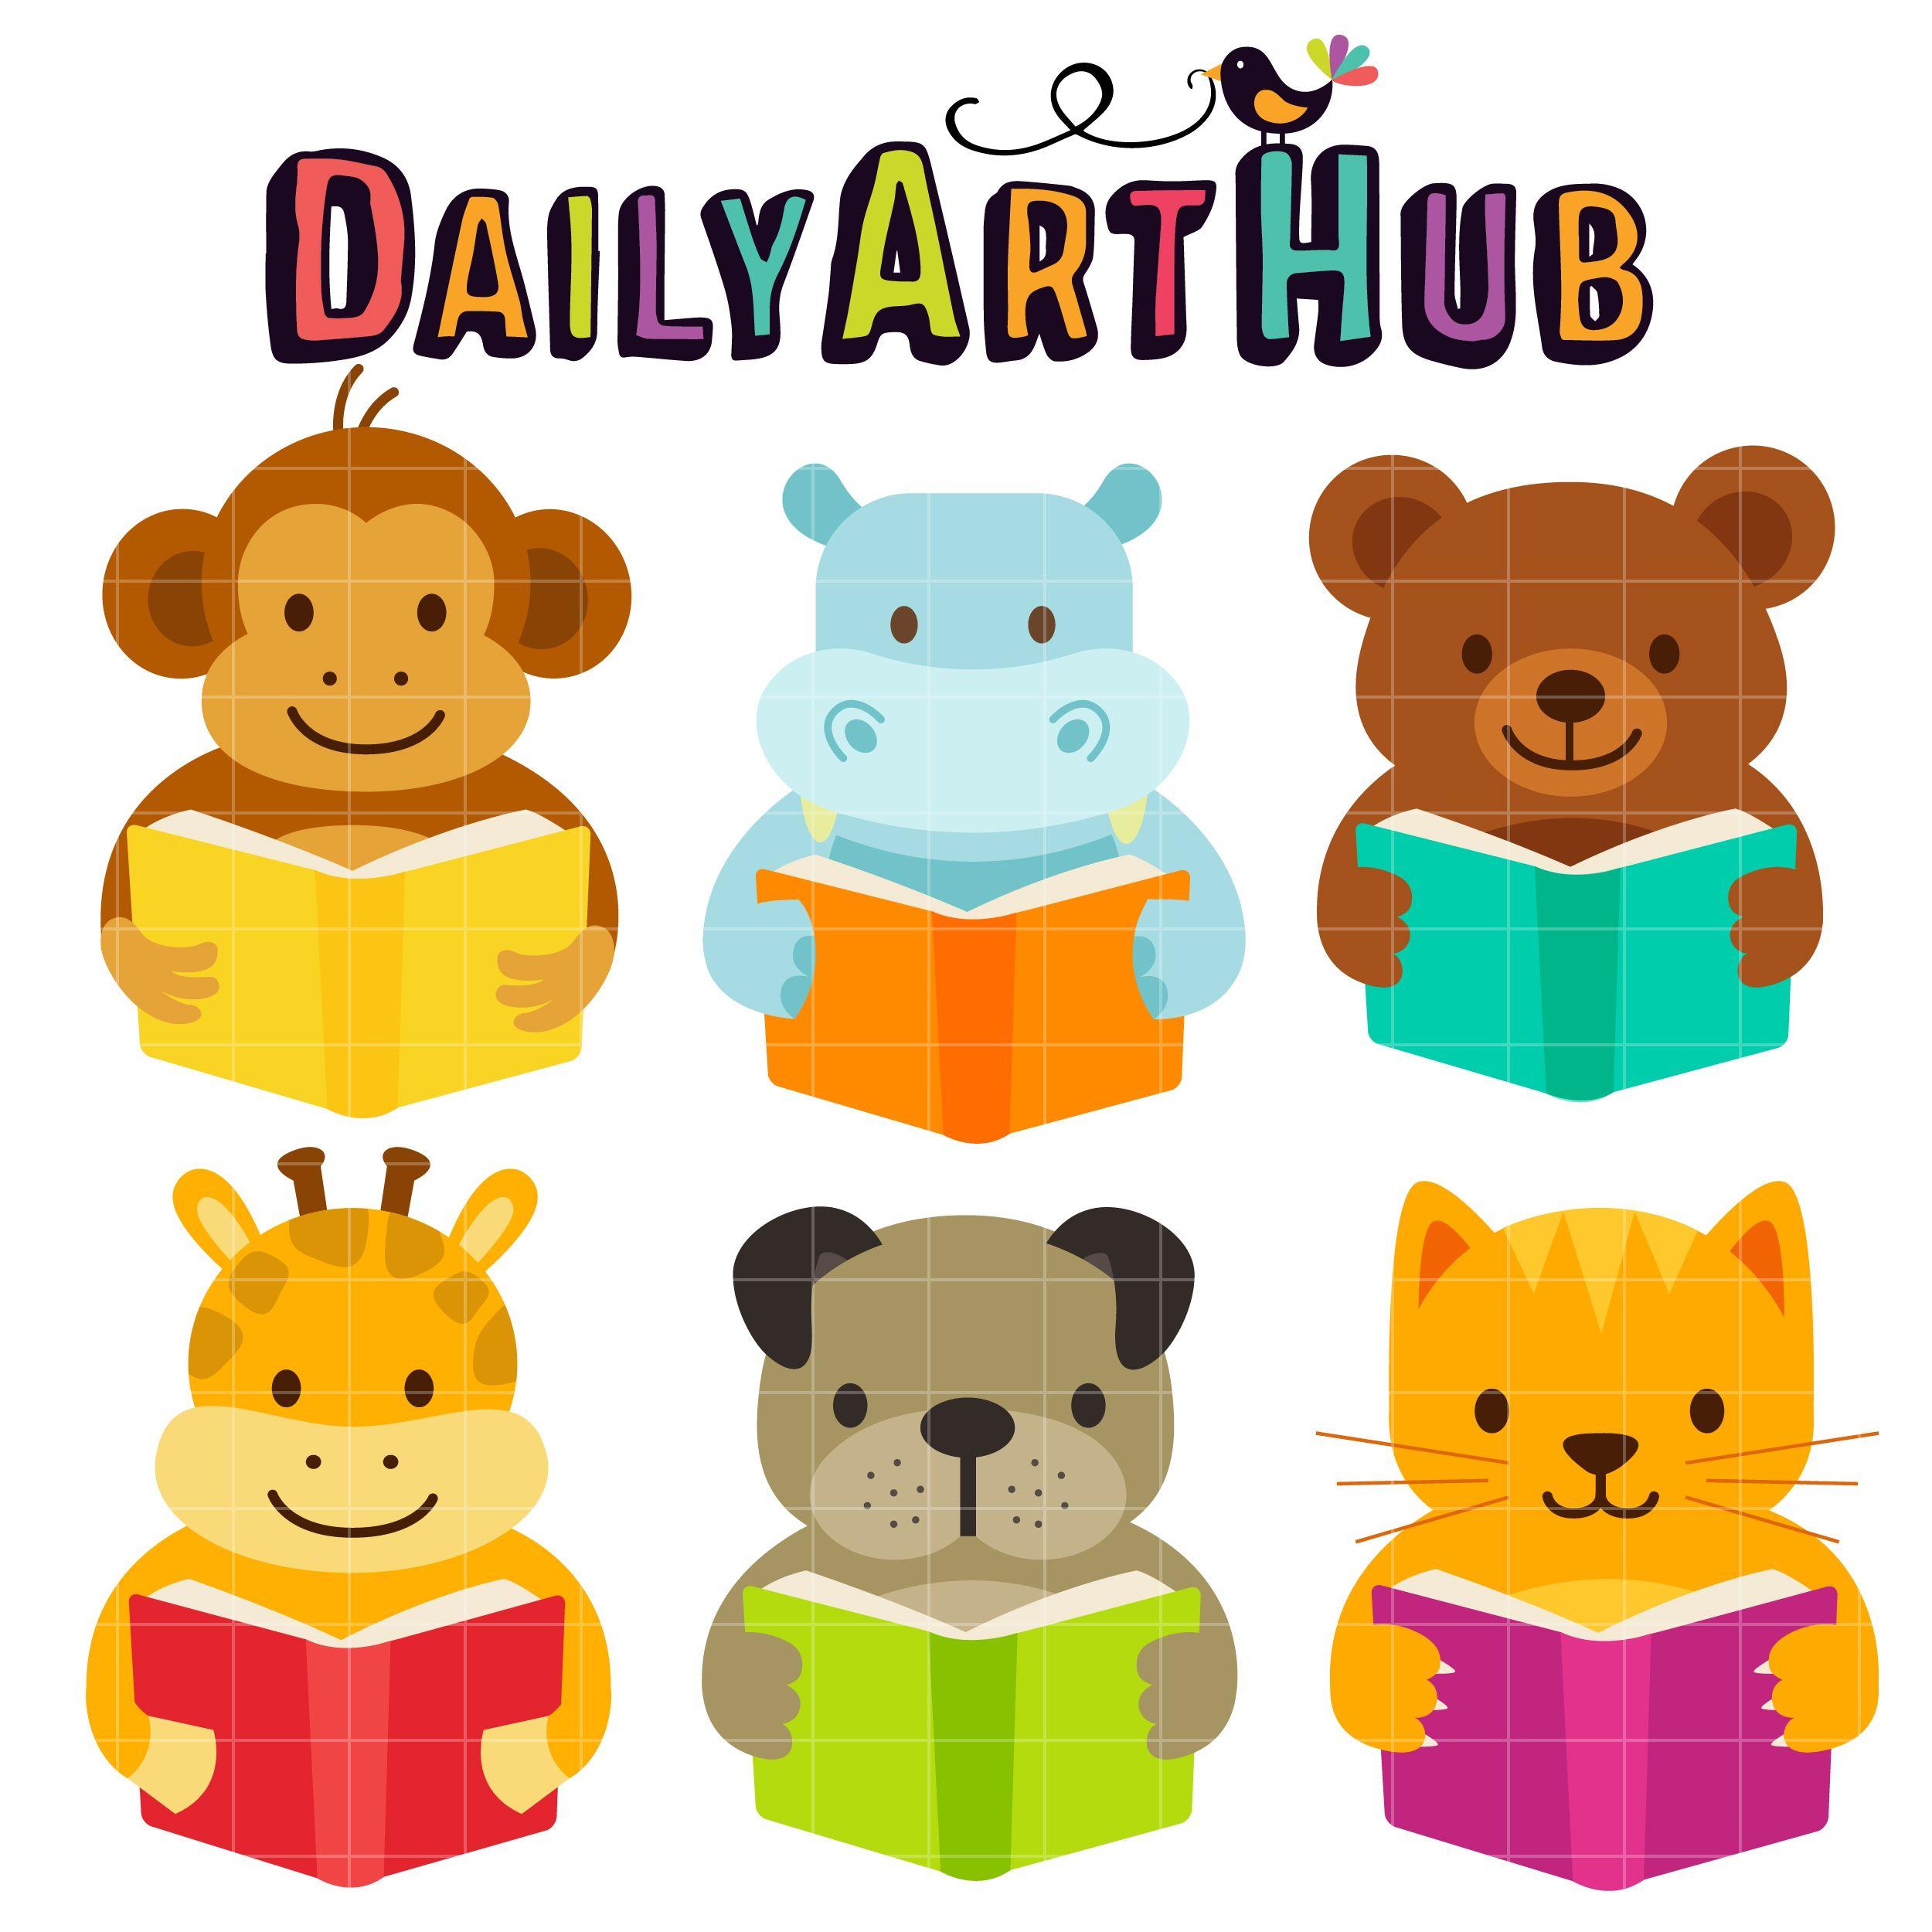 Cute Reading Animals Clip Art Set Daily Art Hub Free Clip Art Everyday Clip Art Art Hub Digital Clip Art